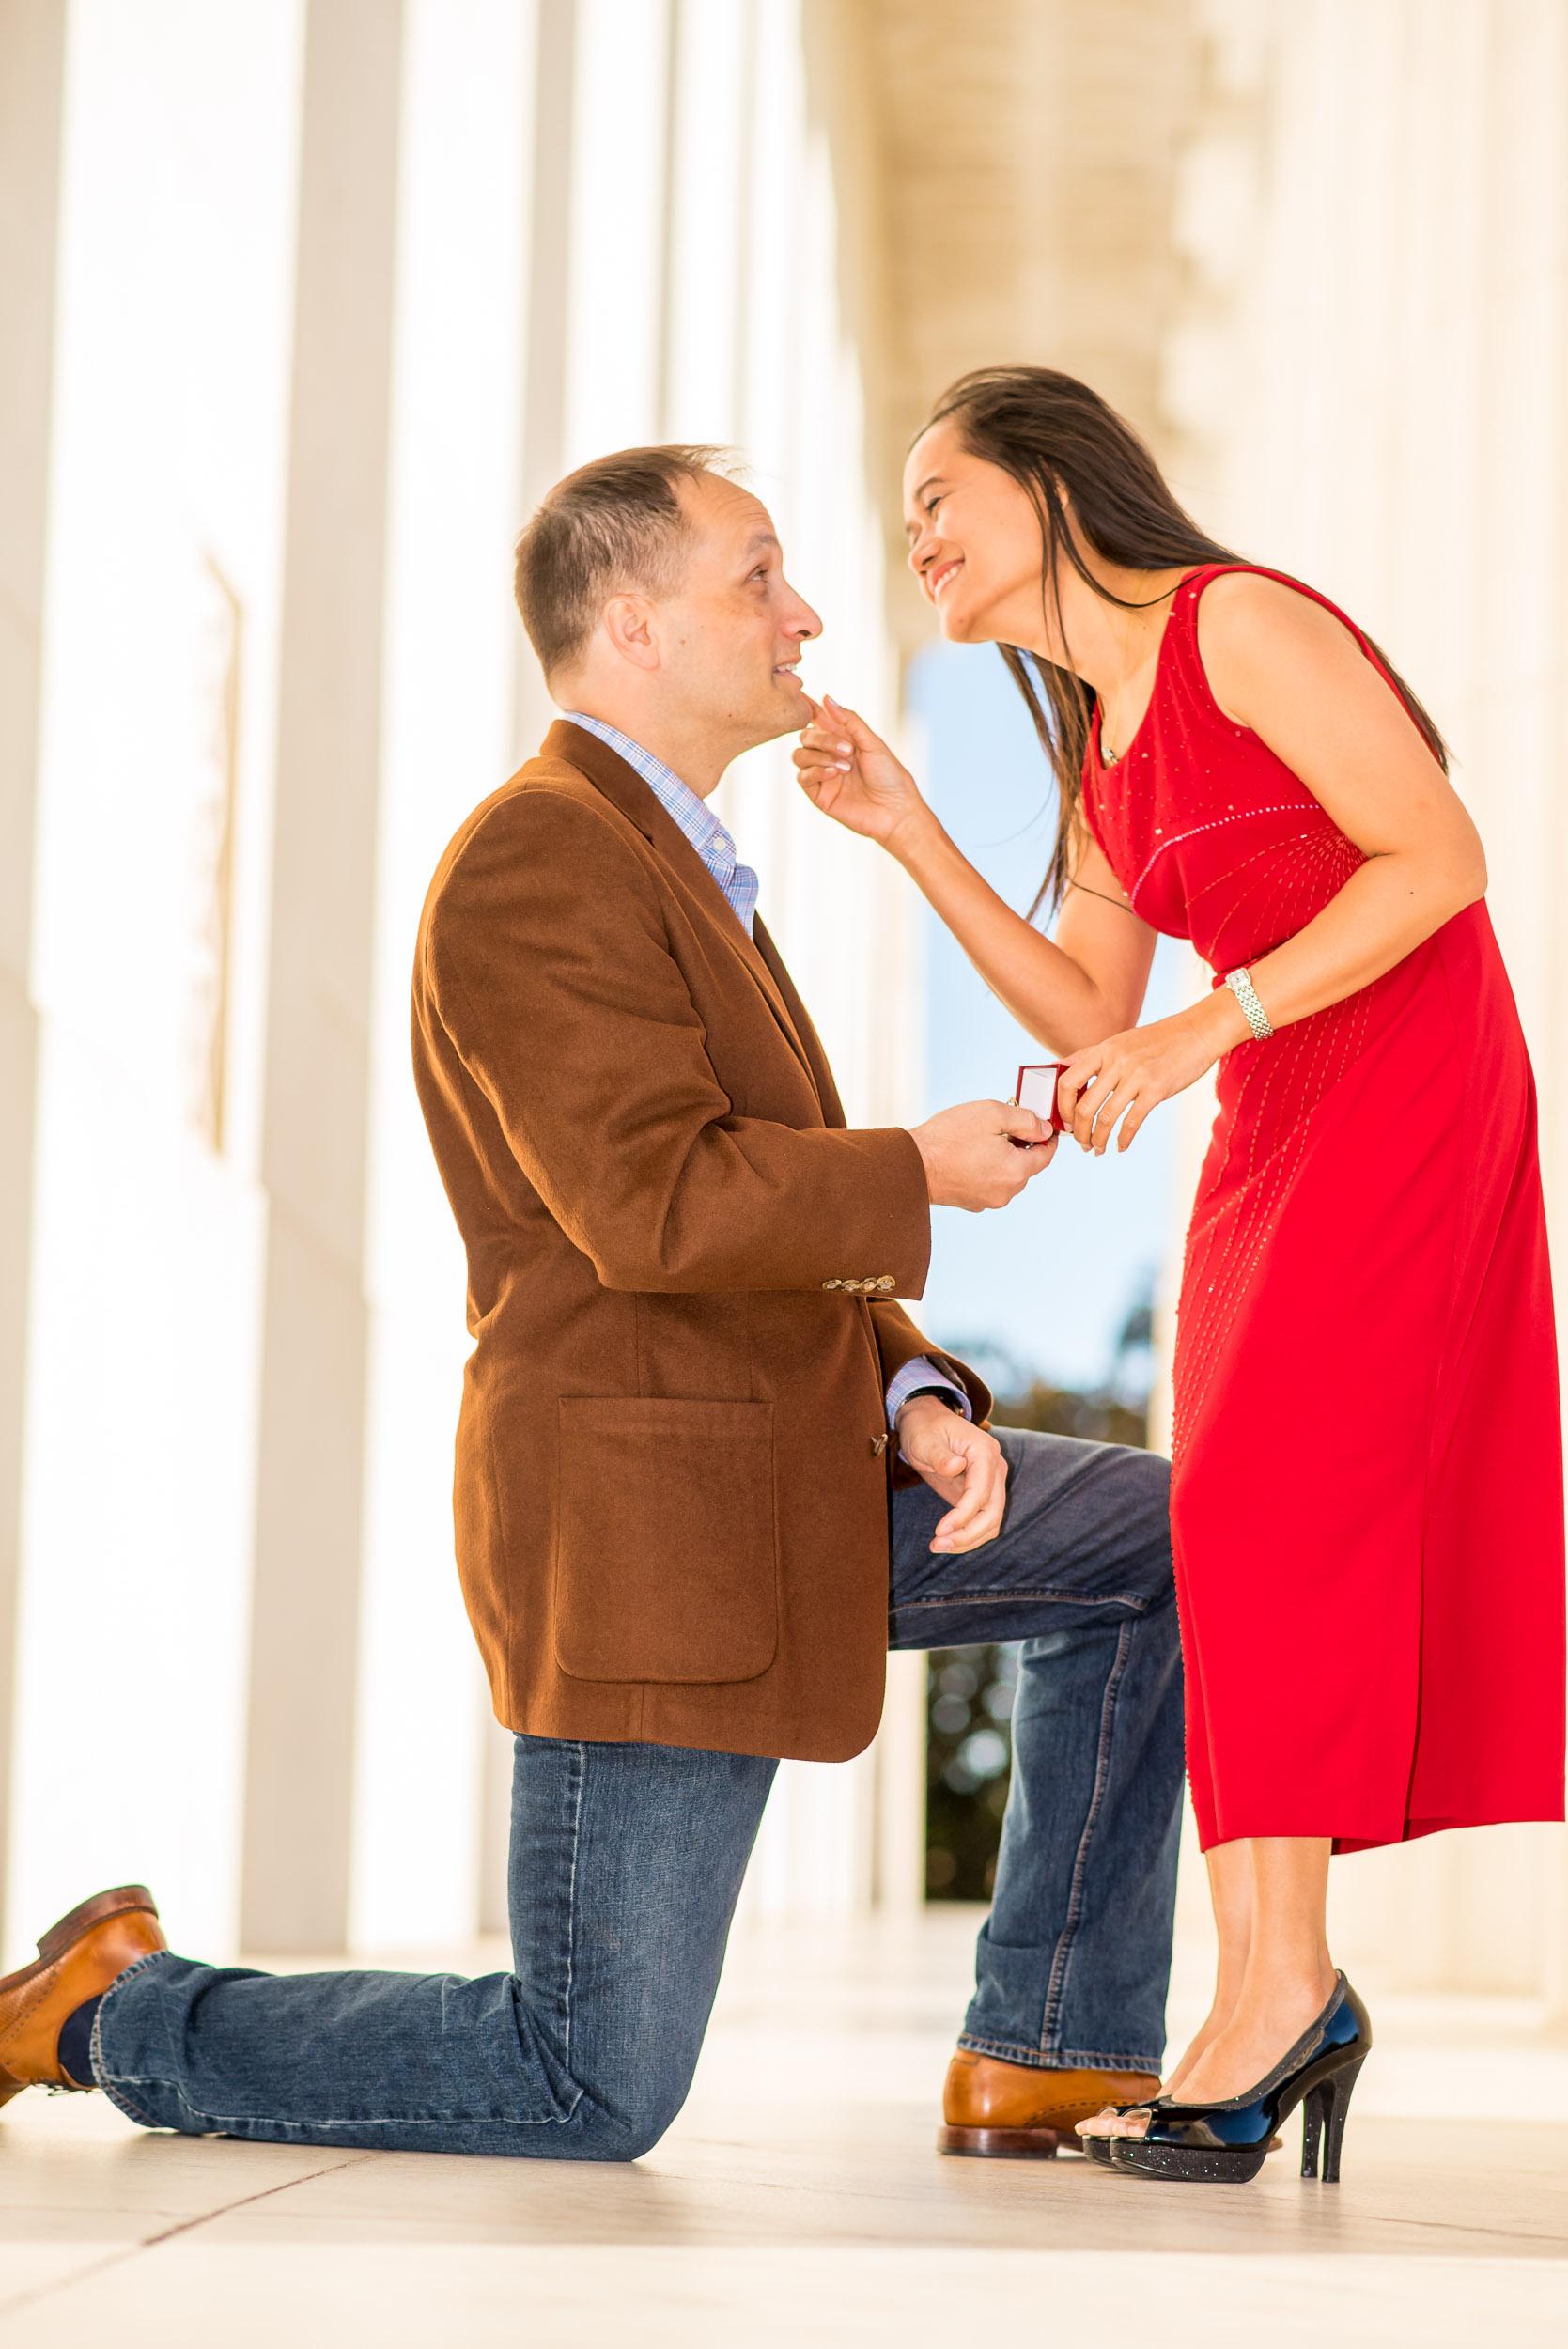 Dennis Soans Photography Weddings Engagements Fairfax VA